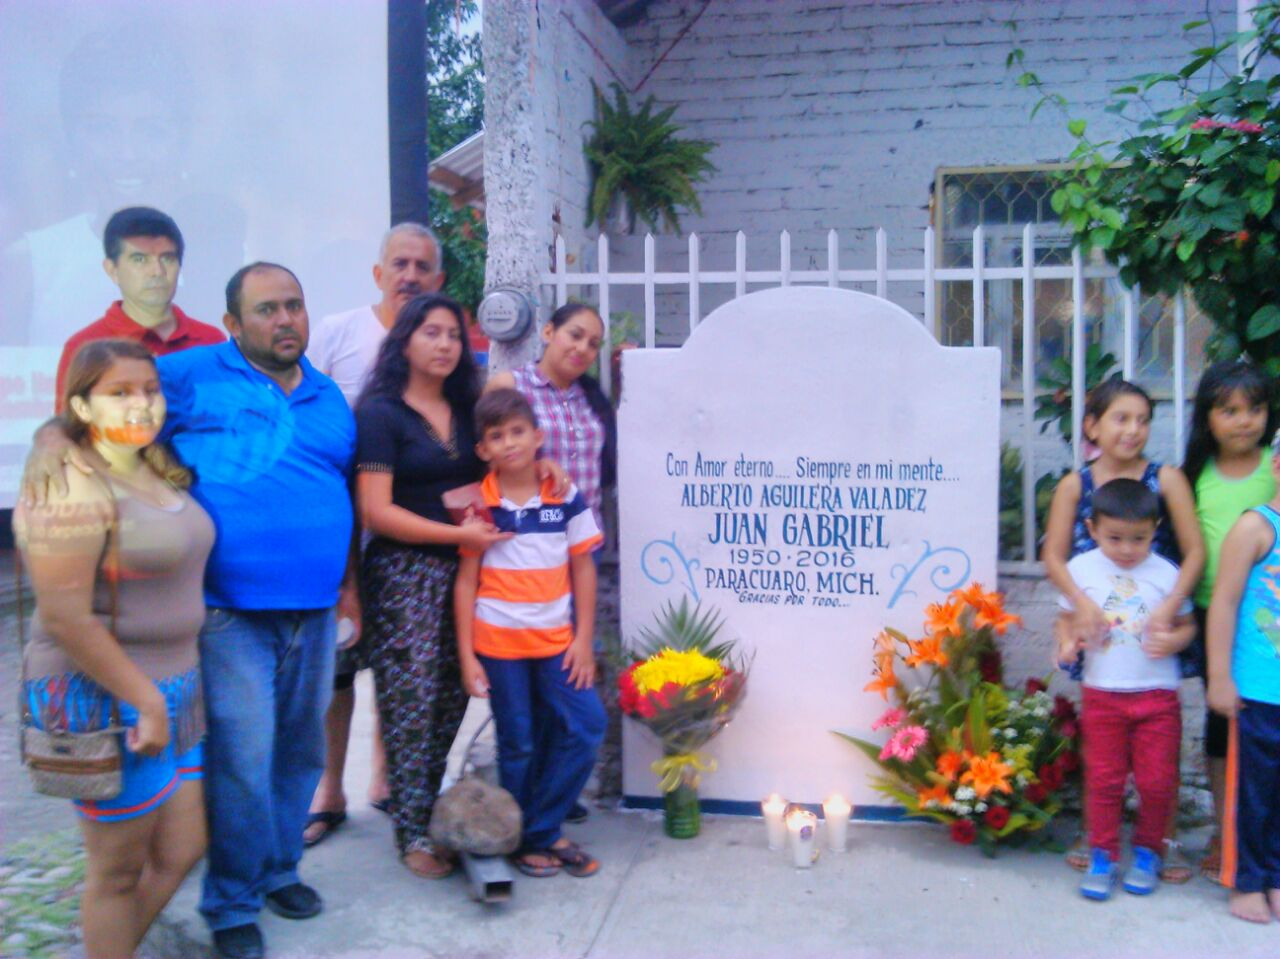 Parácuaro Michoacán le llora a Juan Gabriel la leyenda de México